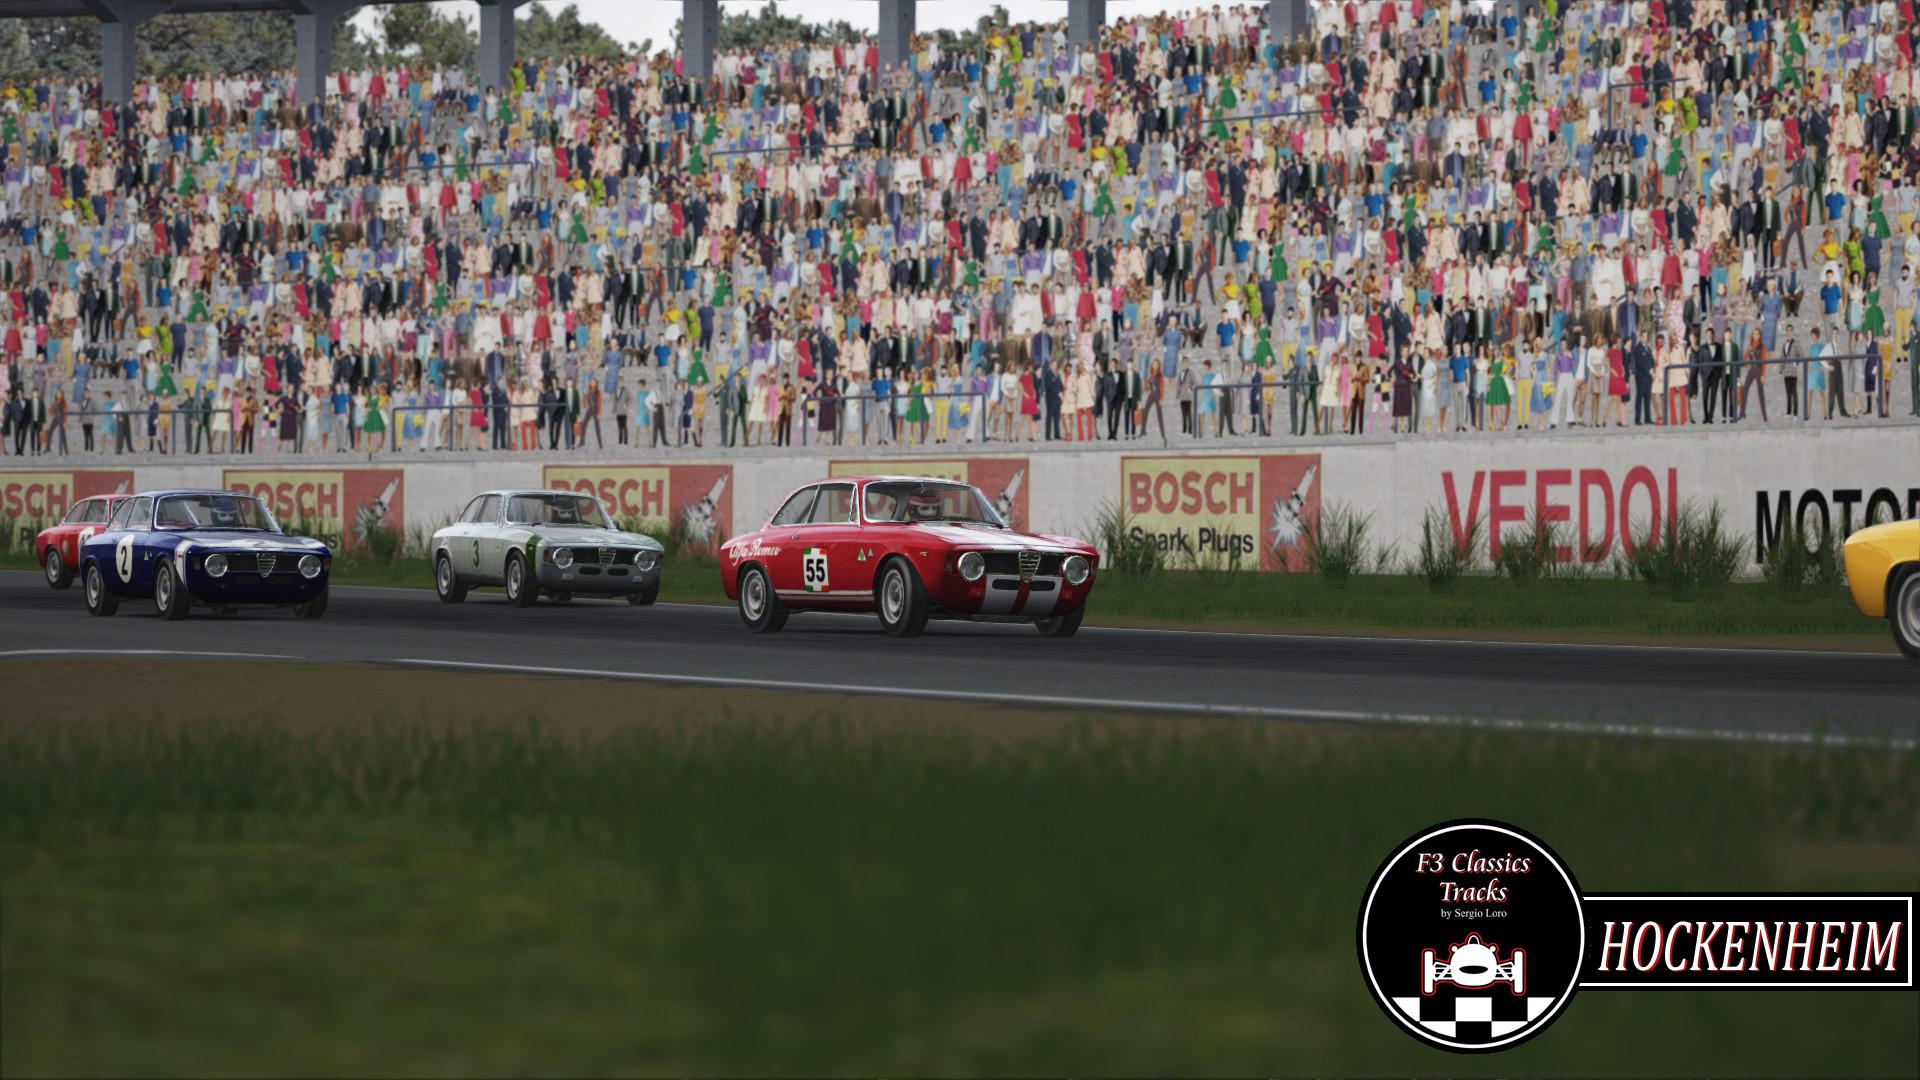 60s Hockenheim - Assetto Corsa.jpg